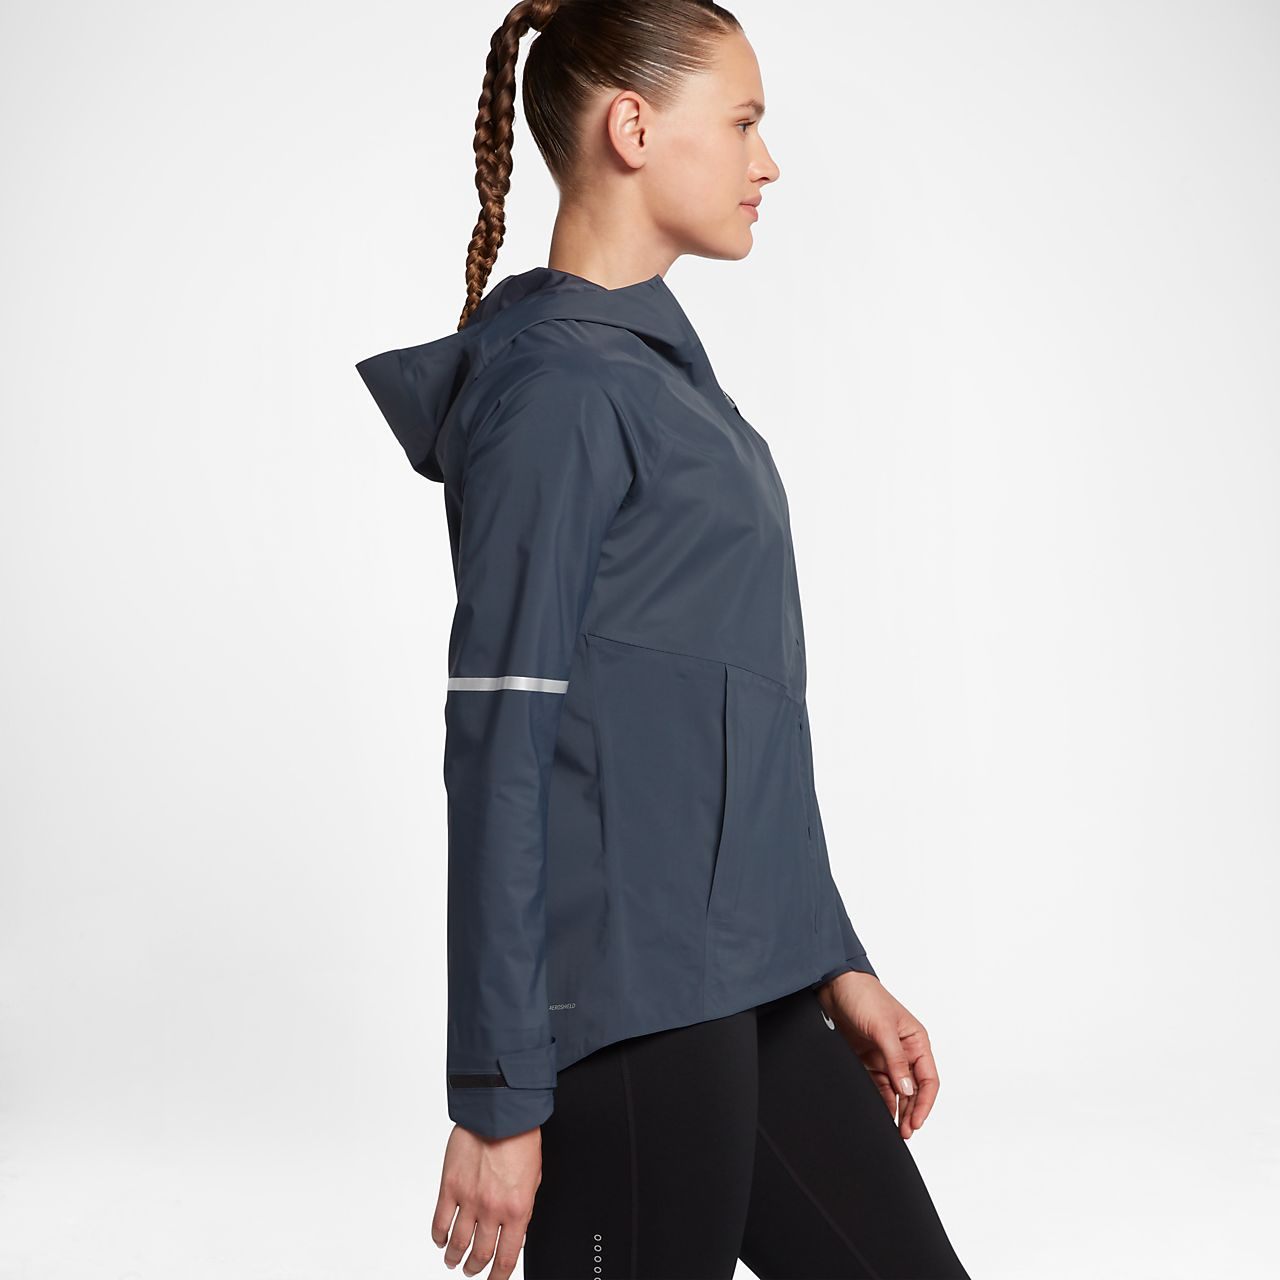 41358177a6c8 Nike Zonal AeroShield Women s Running Jacket